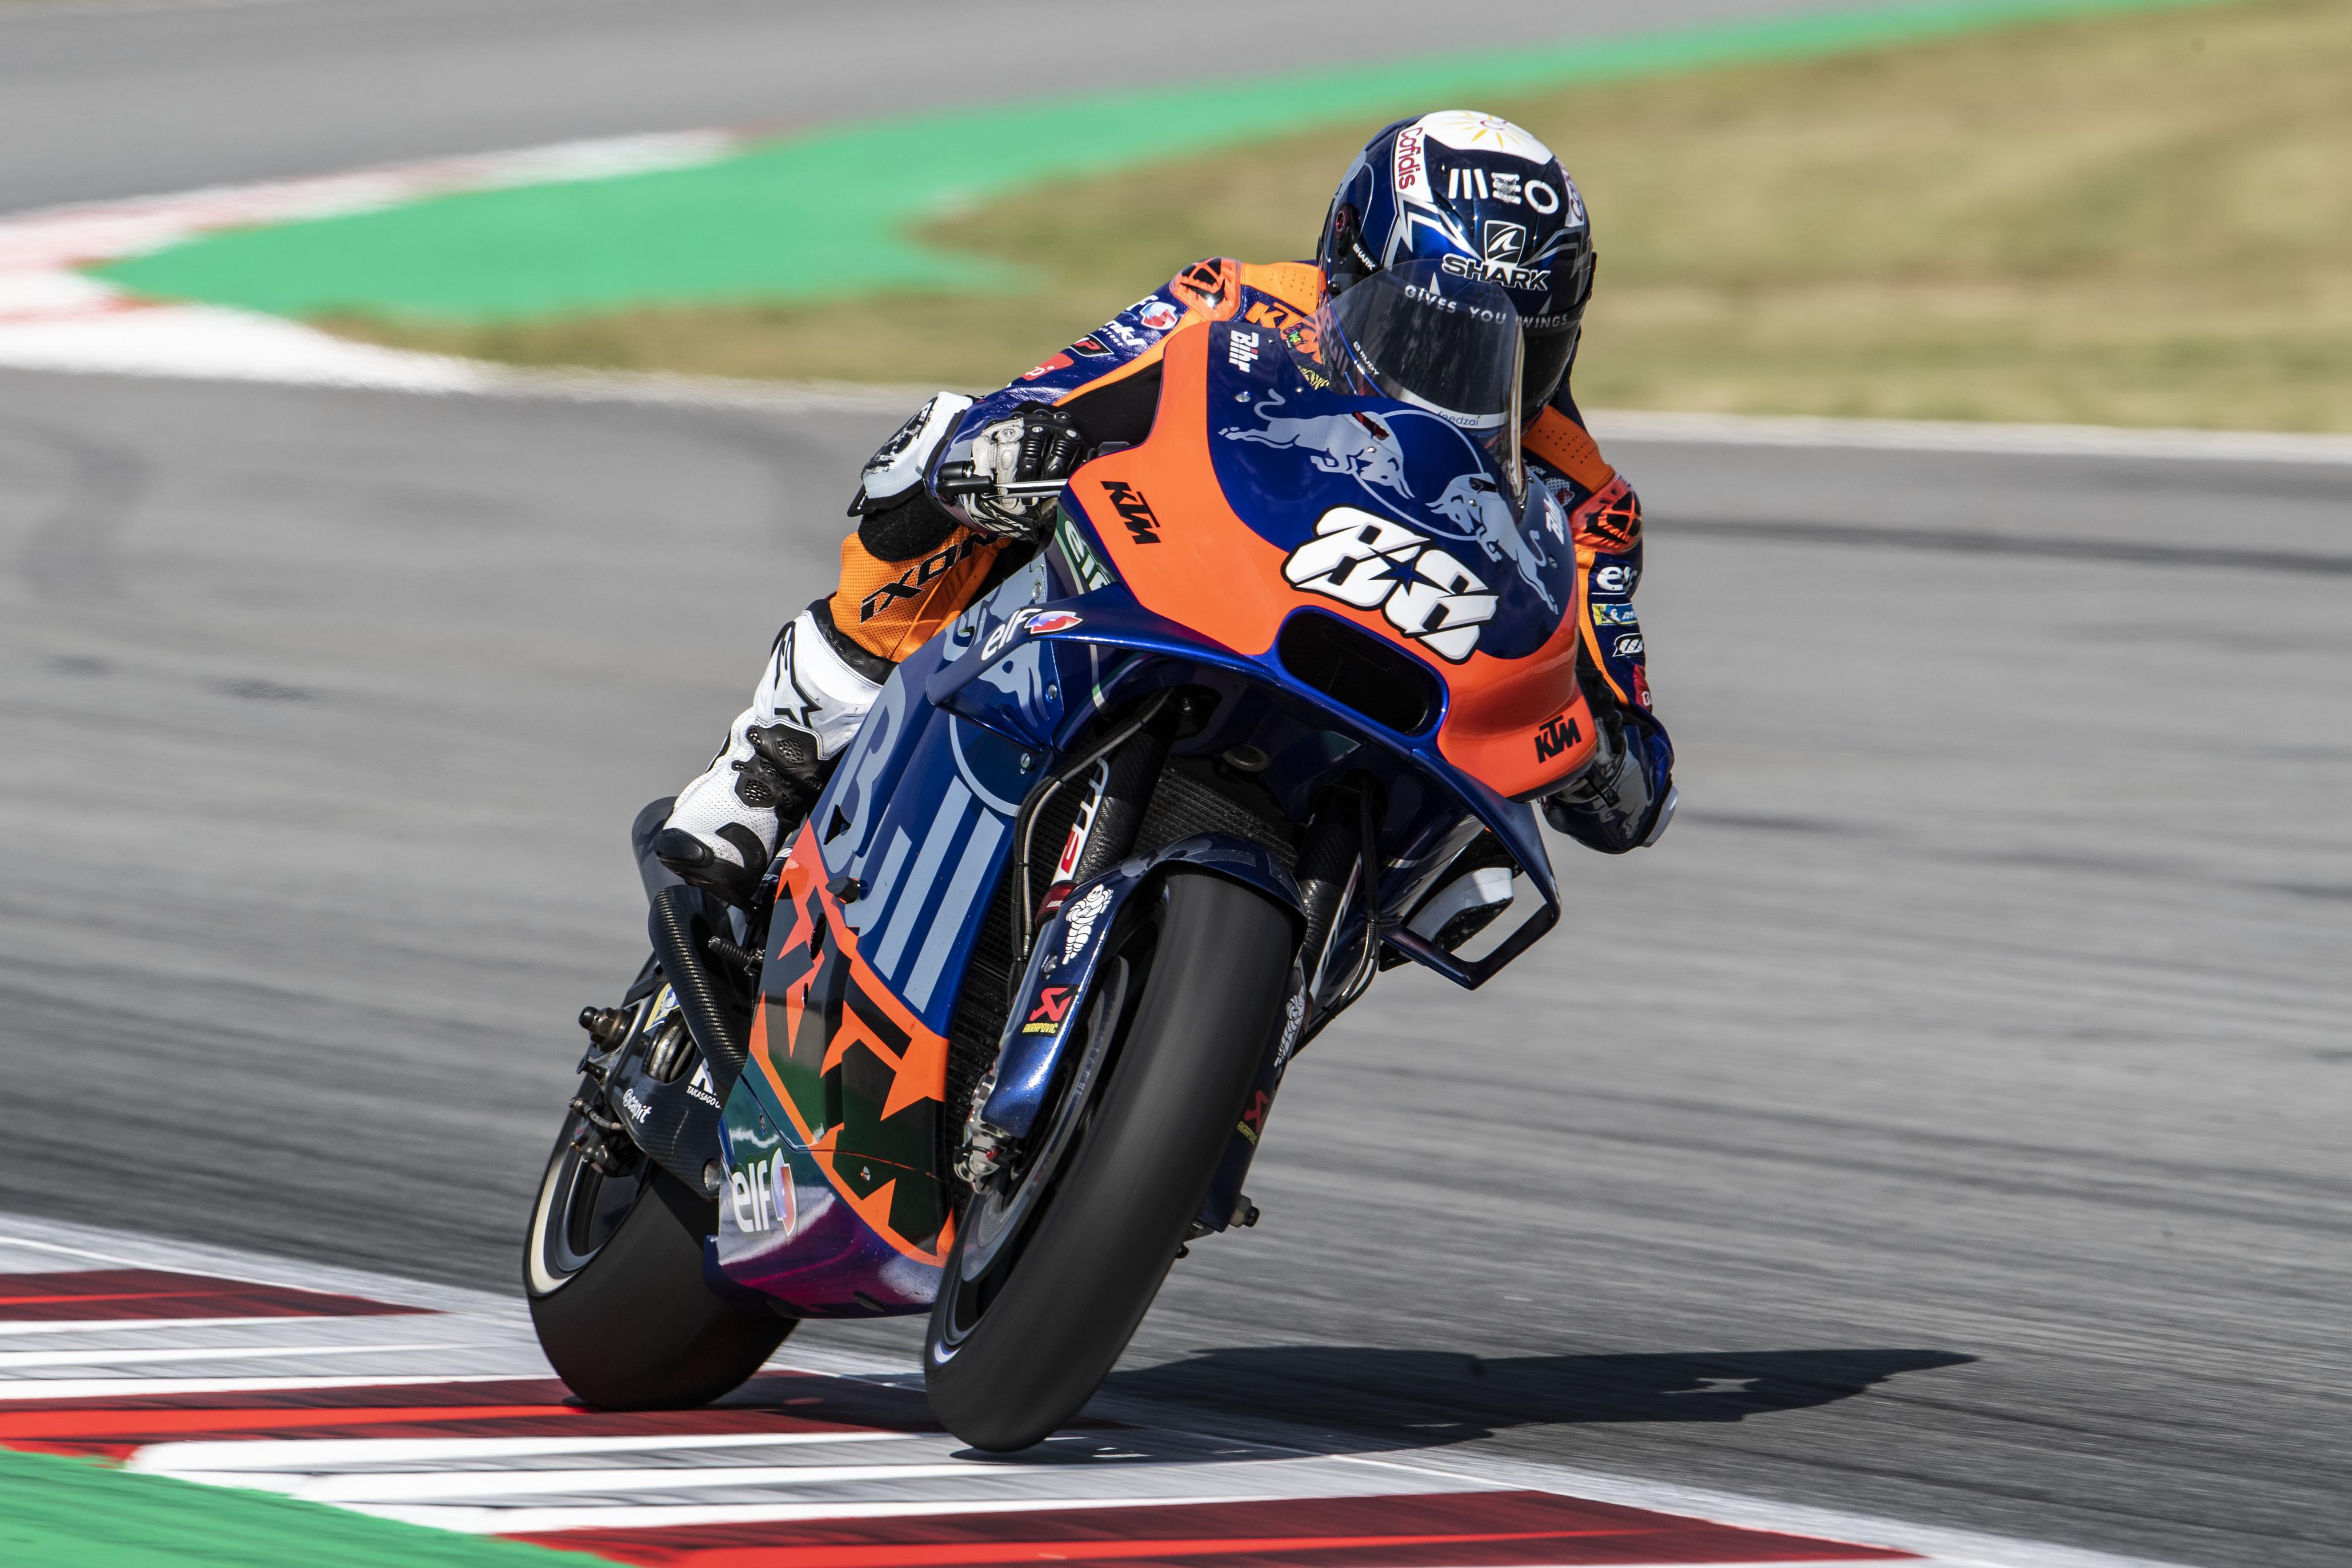 MotoGP: Tempos dos Treinos de Barcelona